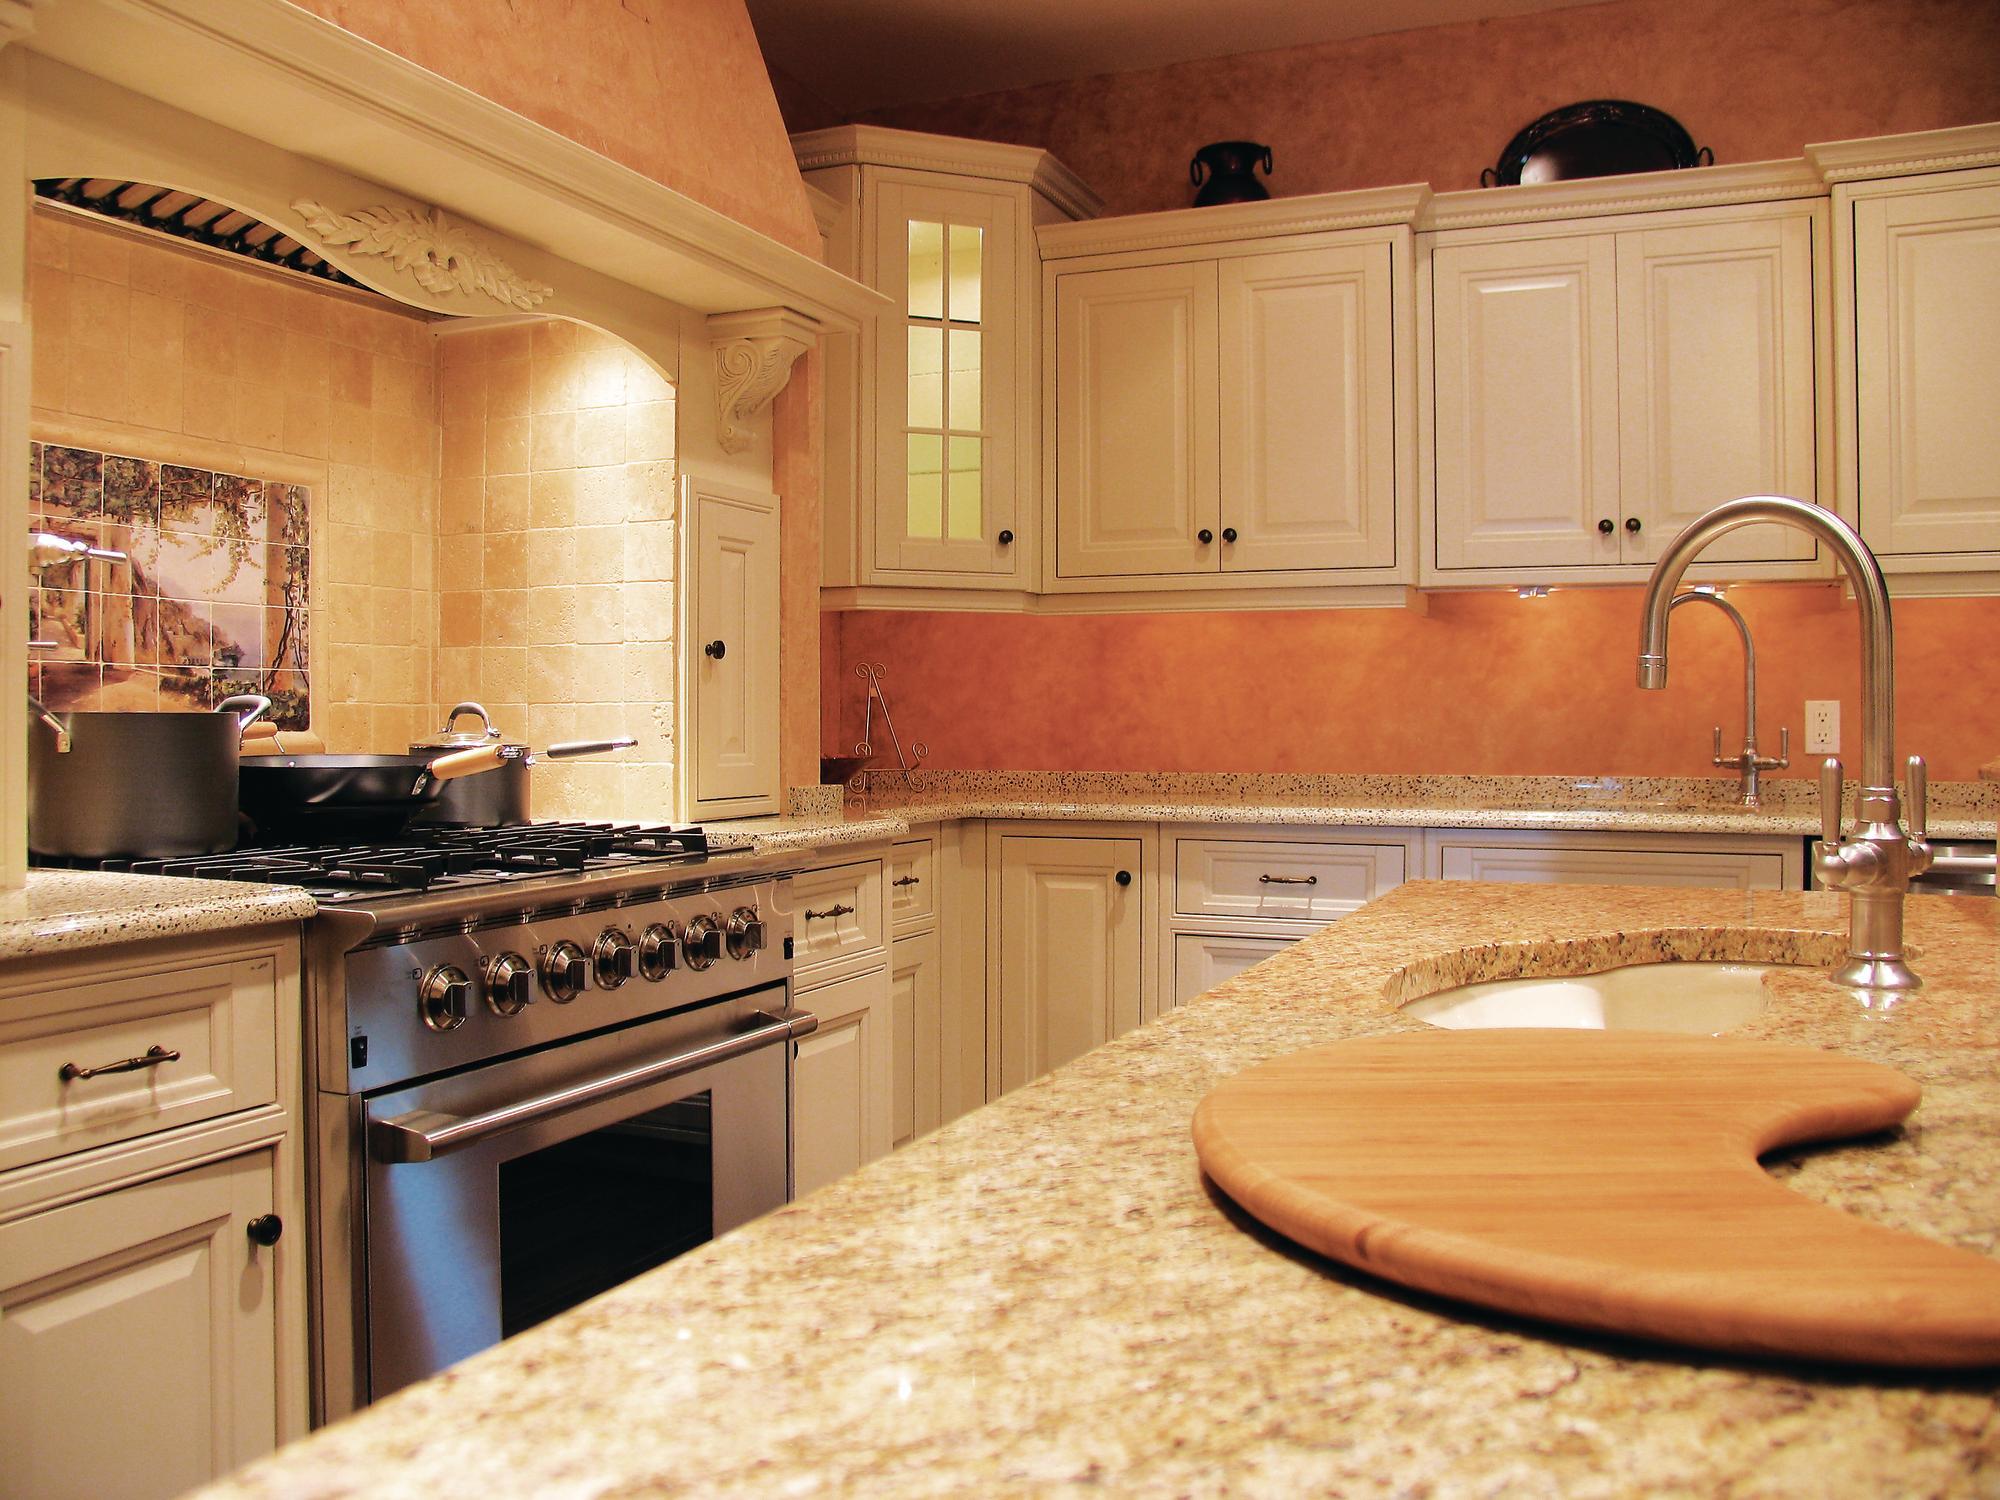 Green Gauge Alure Home Improvements Green Kitchen Display - Alure bathroom remodeling